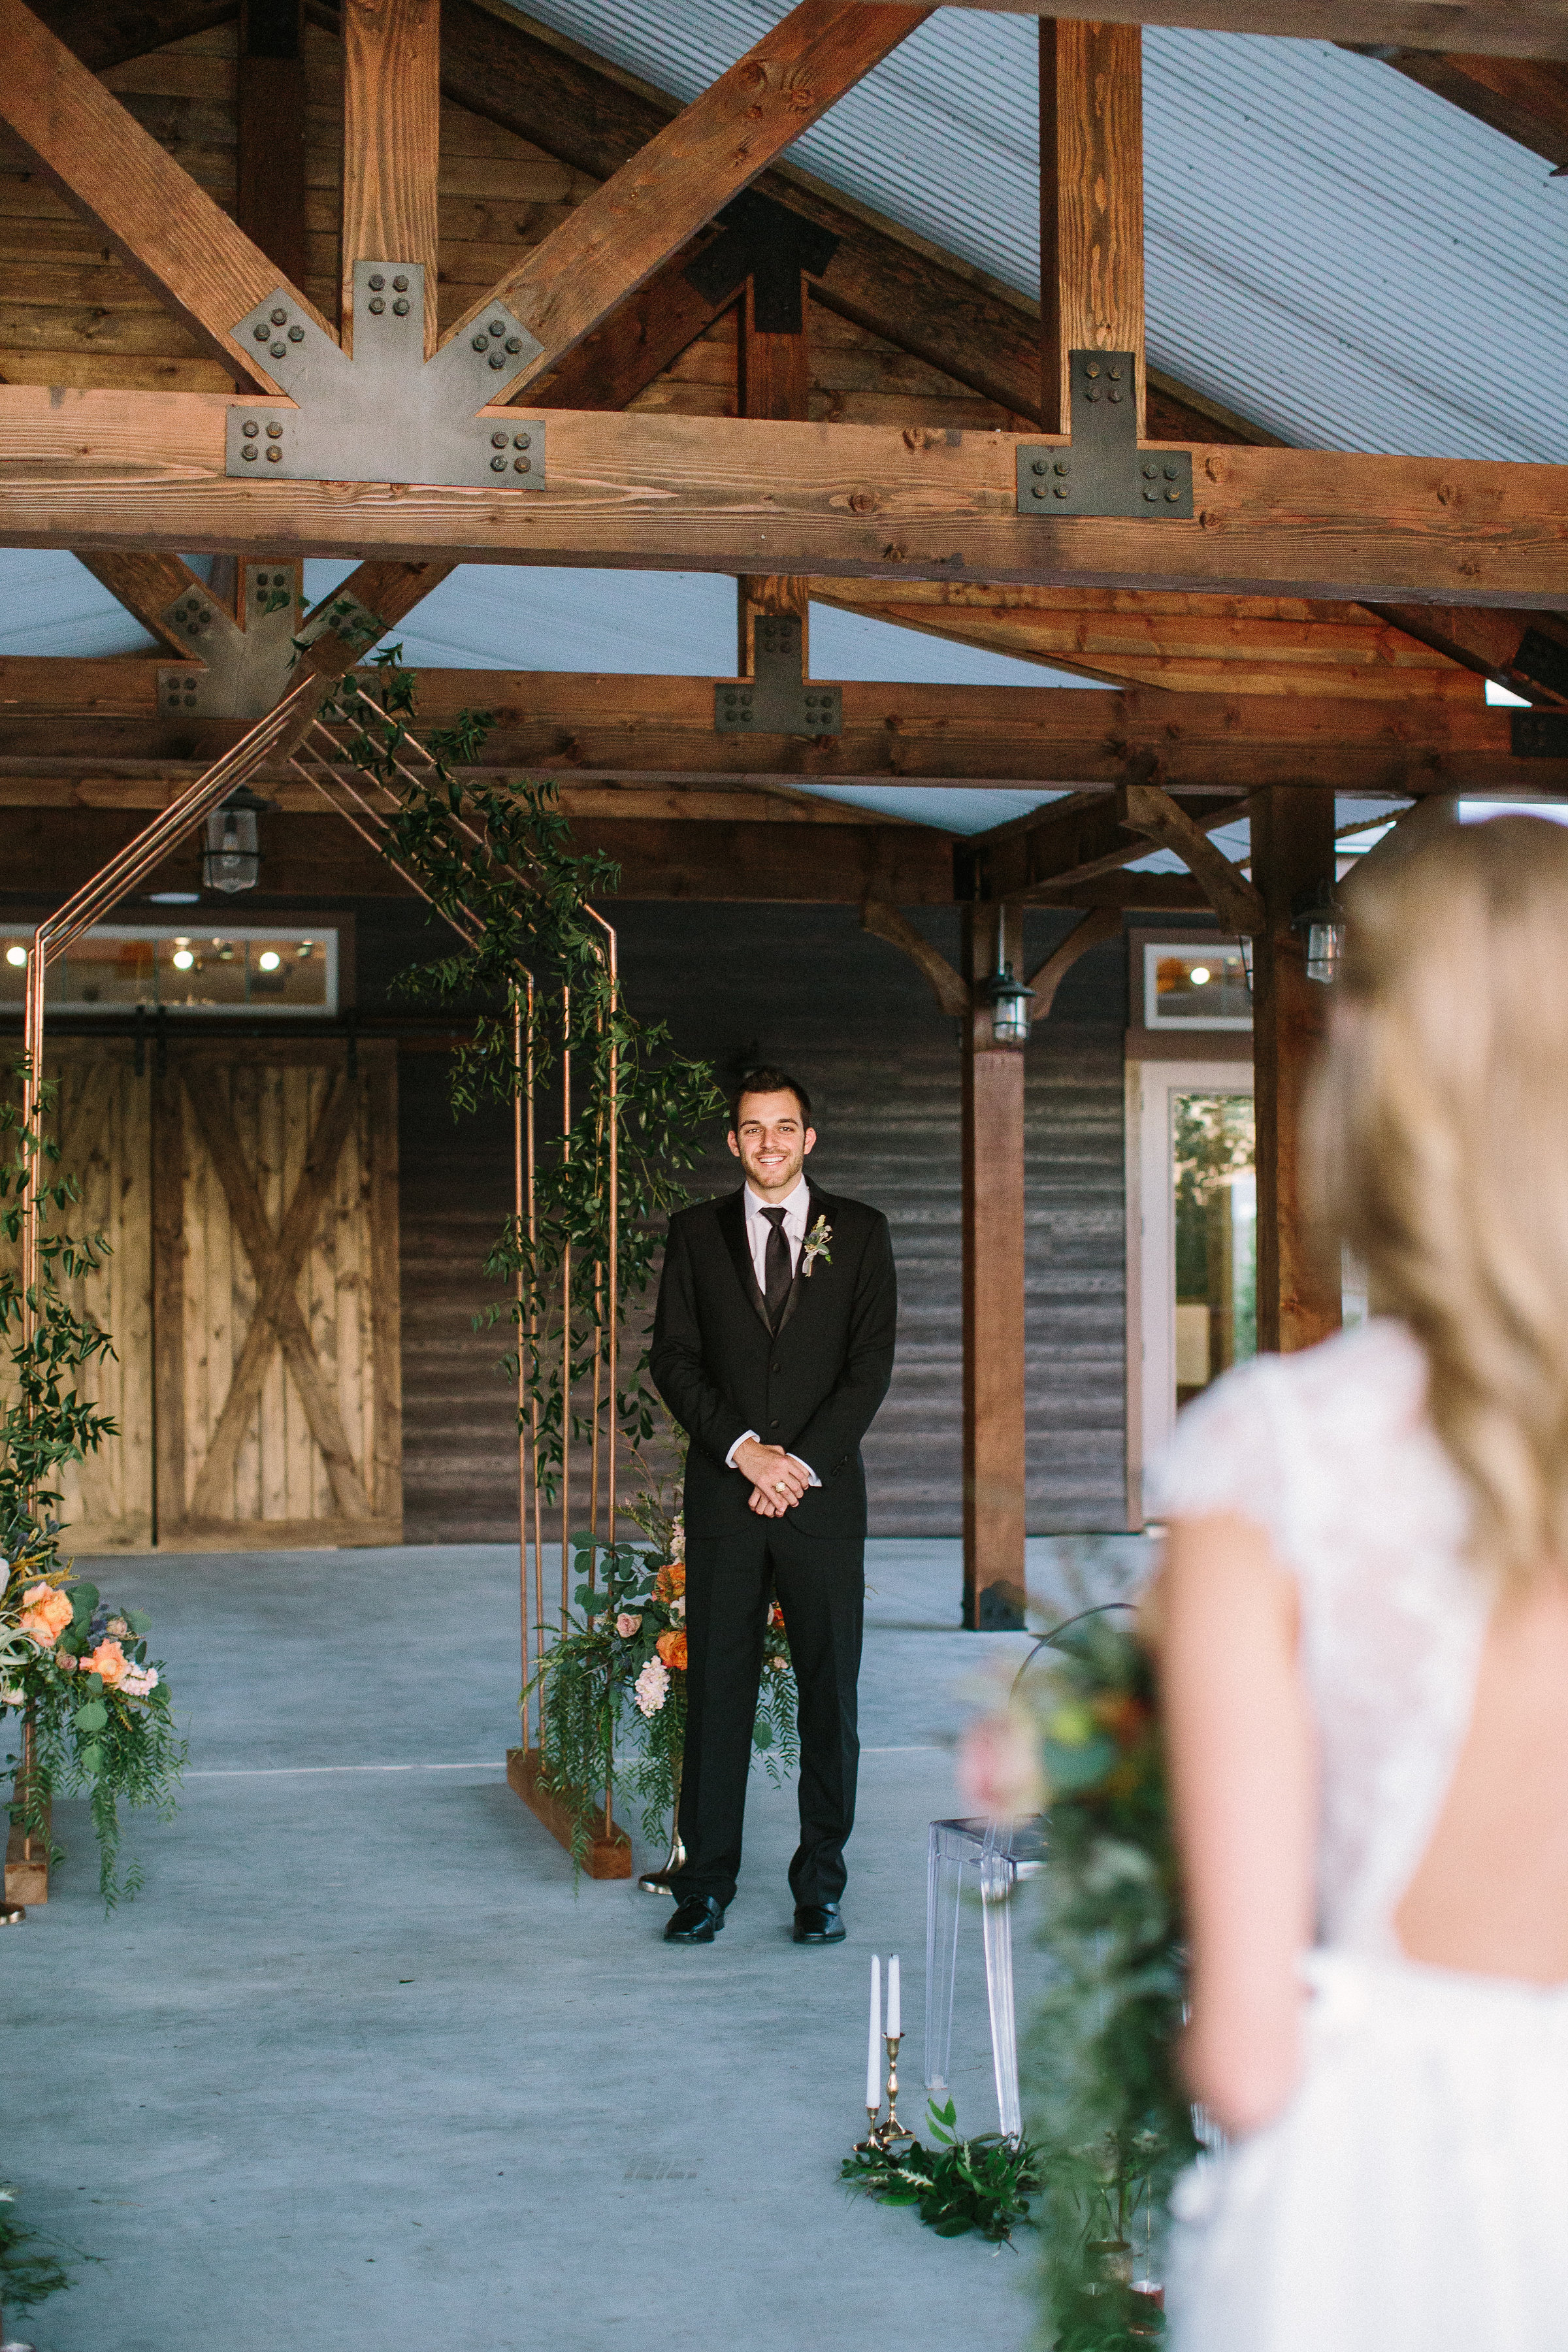 Ellen-Ashton-Photography-Peach-Creek-Ranch-Weddings-Wed-and-Prosper373